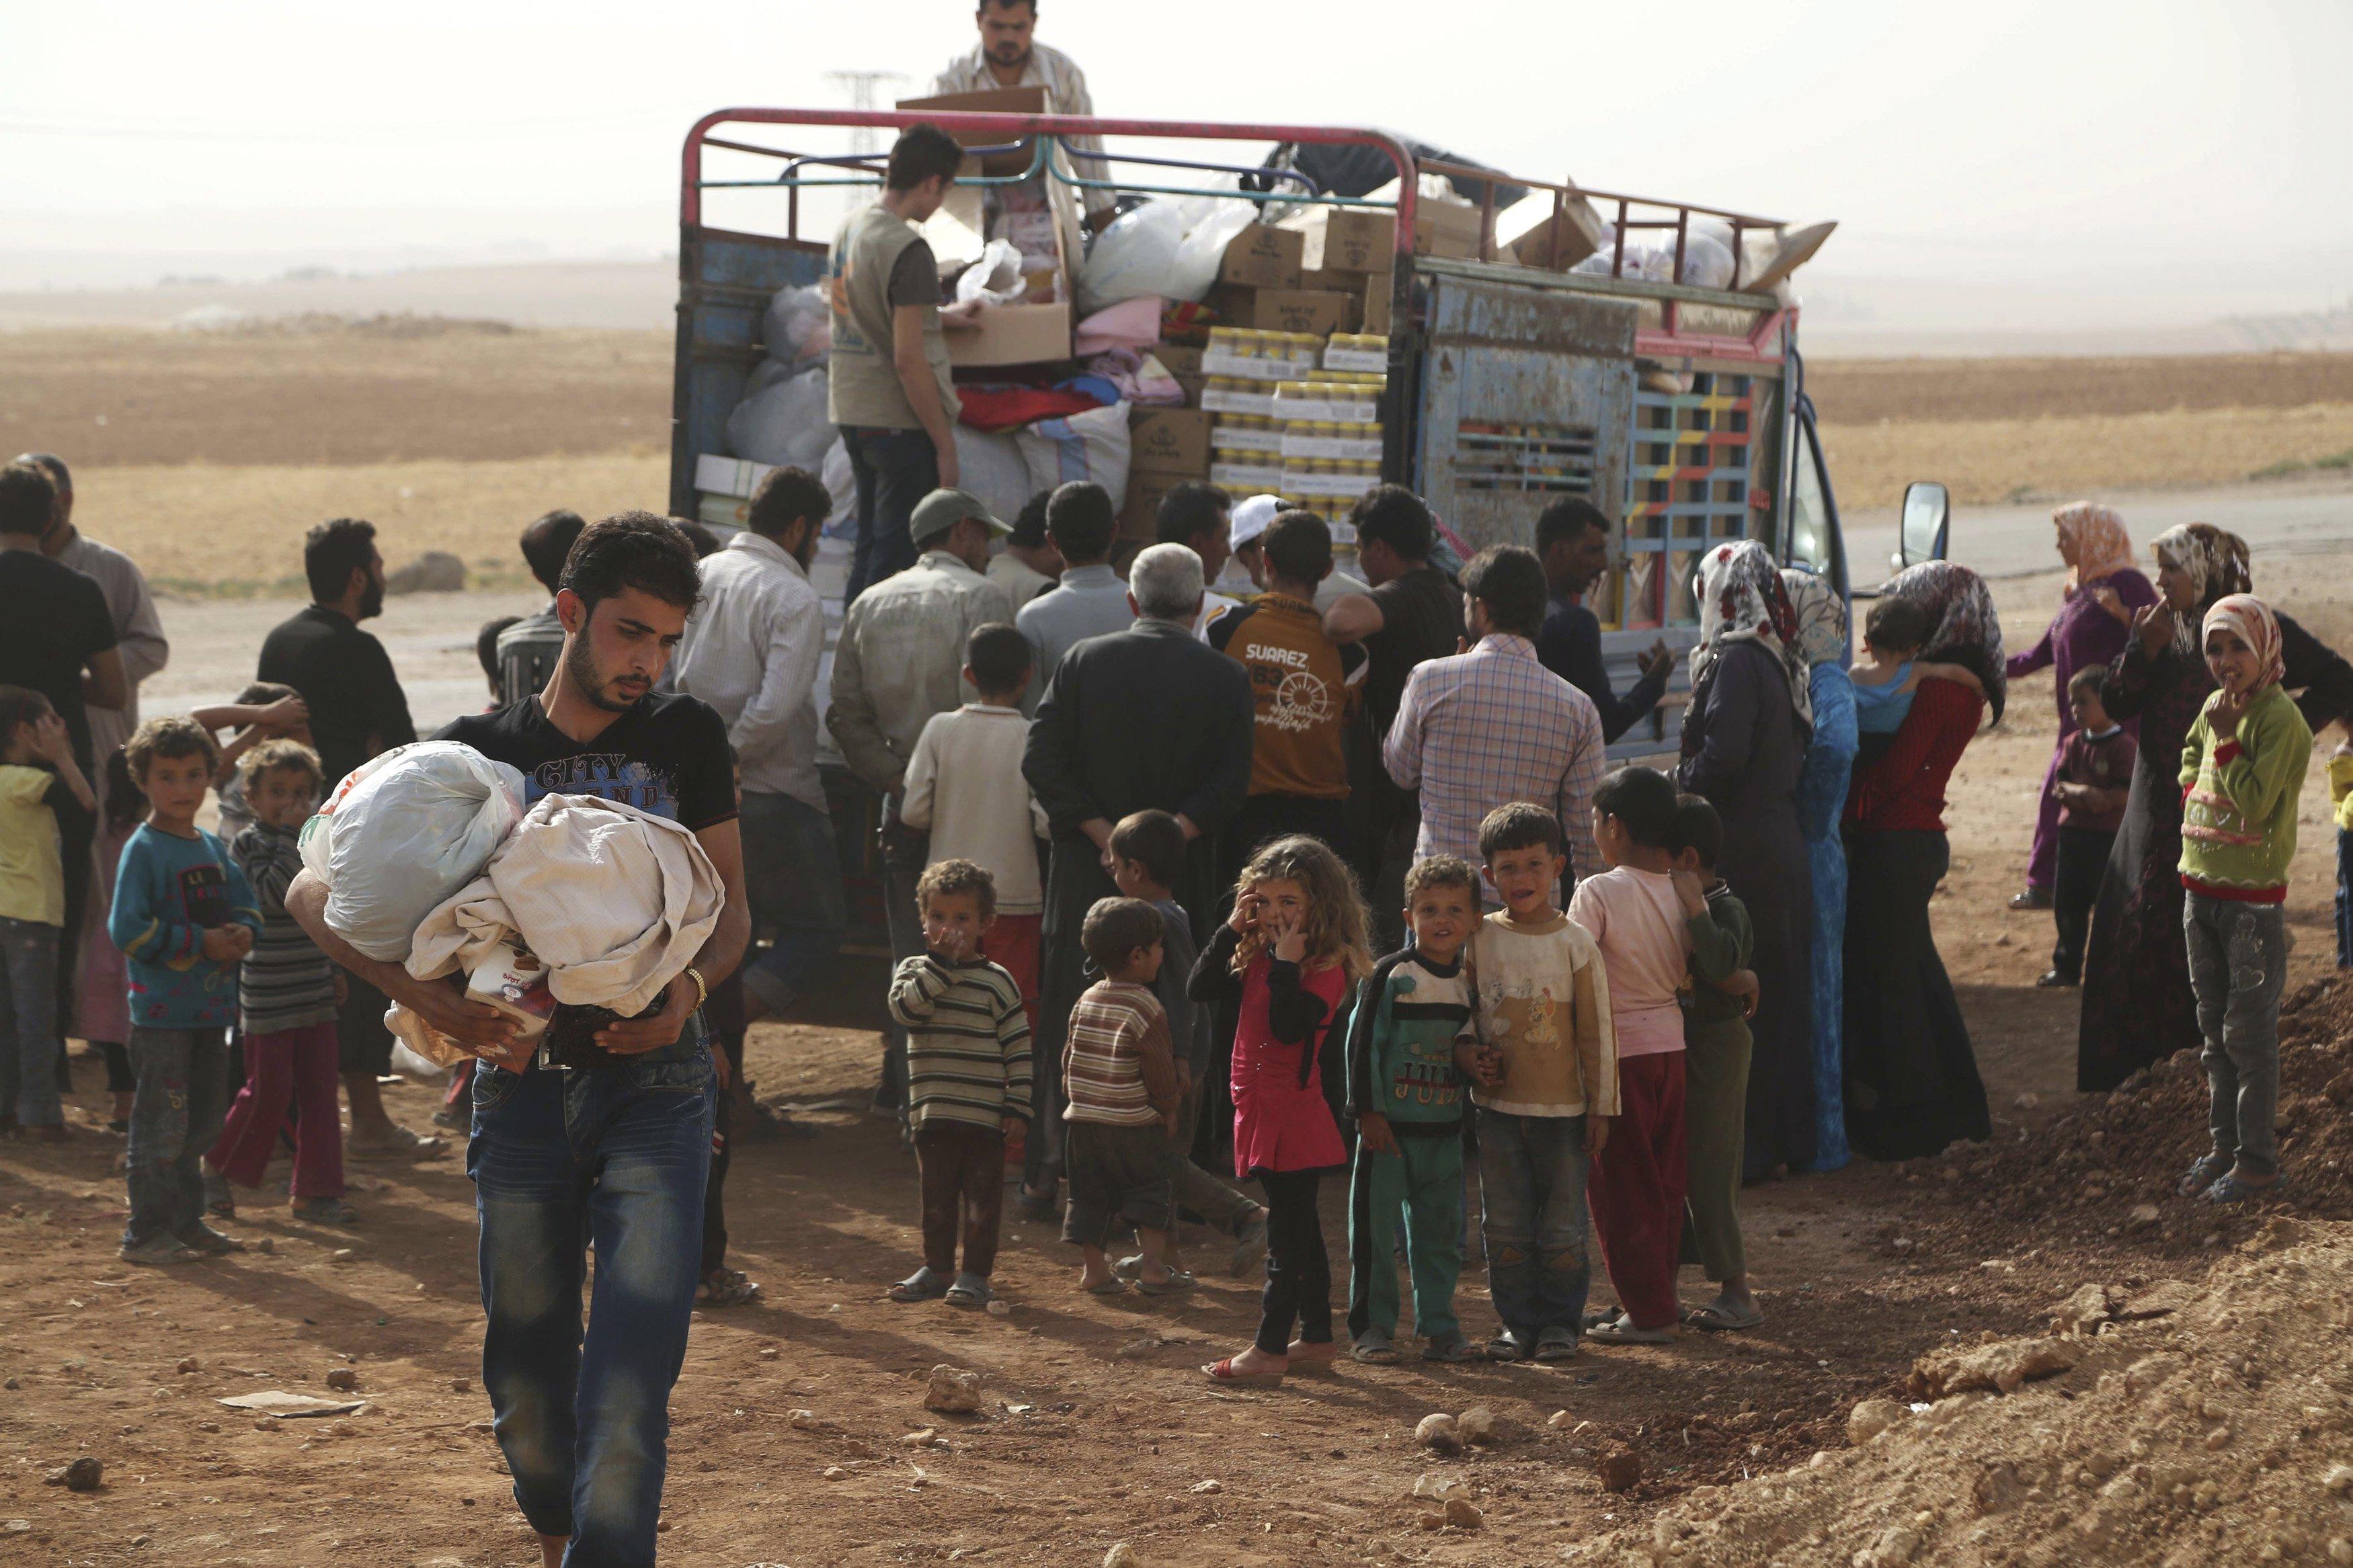 Penduduk Suriah yang melarikan diri dari peperangan di wilayah mereka menerima bantuan kemanusiaan di pinggiran desa Aleppo bagian selatan, Suriah, Rabu (21/10). Perang di Suriah telah membuat sebanyak 35,000 orang mengungsi dari Hader dan Zerbeh di pinggiran barat daya kota Aleppo beberapa hari yang lalu, kata pihak PBB untuk Koordinasi Kemanusiaan (OCHA) pada hari Senin. ANTARA FOTO/REUTERS/Hosam Katan.